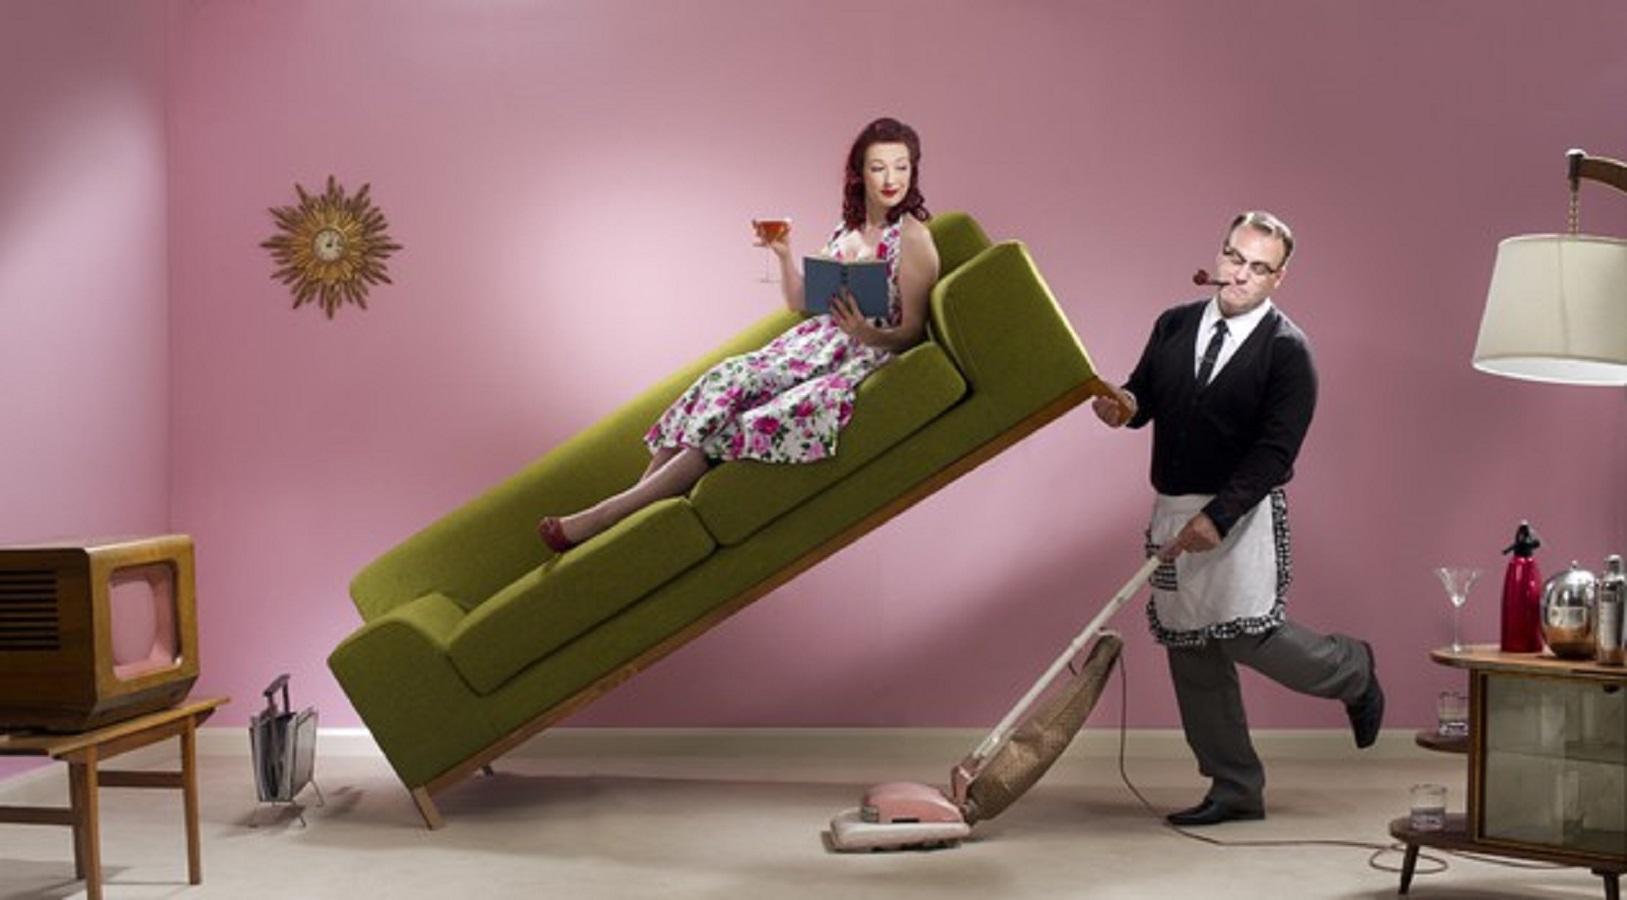 Dimagrire, pulizie casalinghe: quante calorie si bruciano